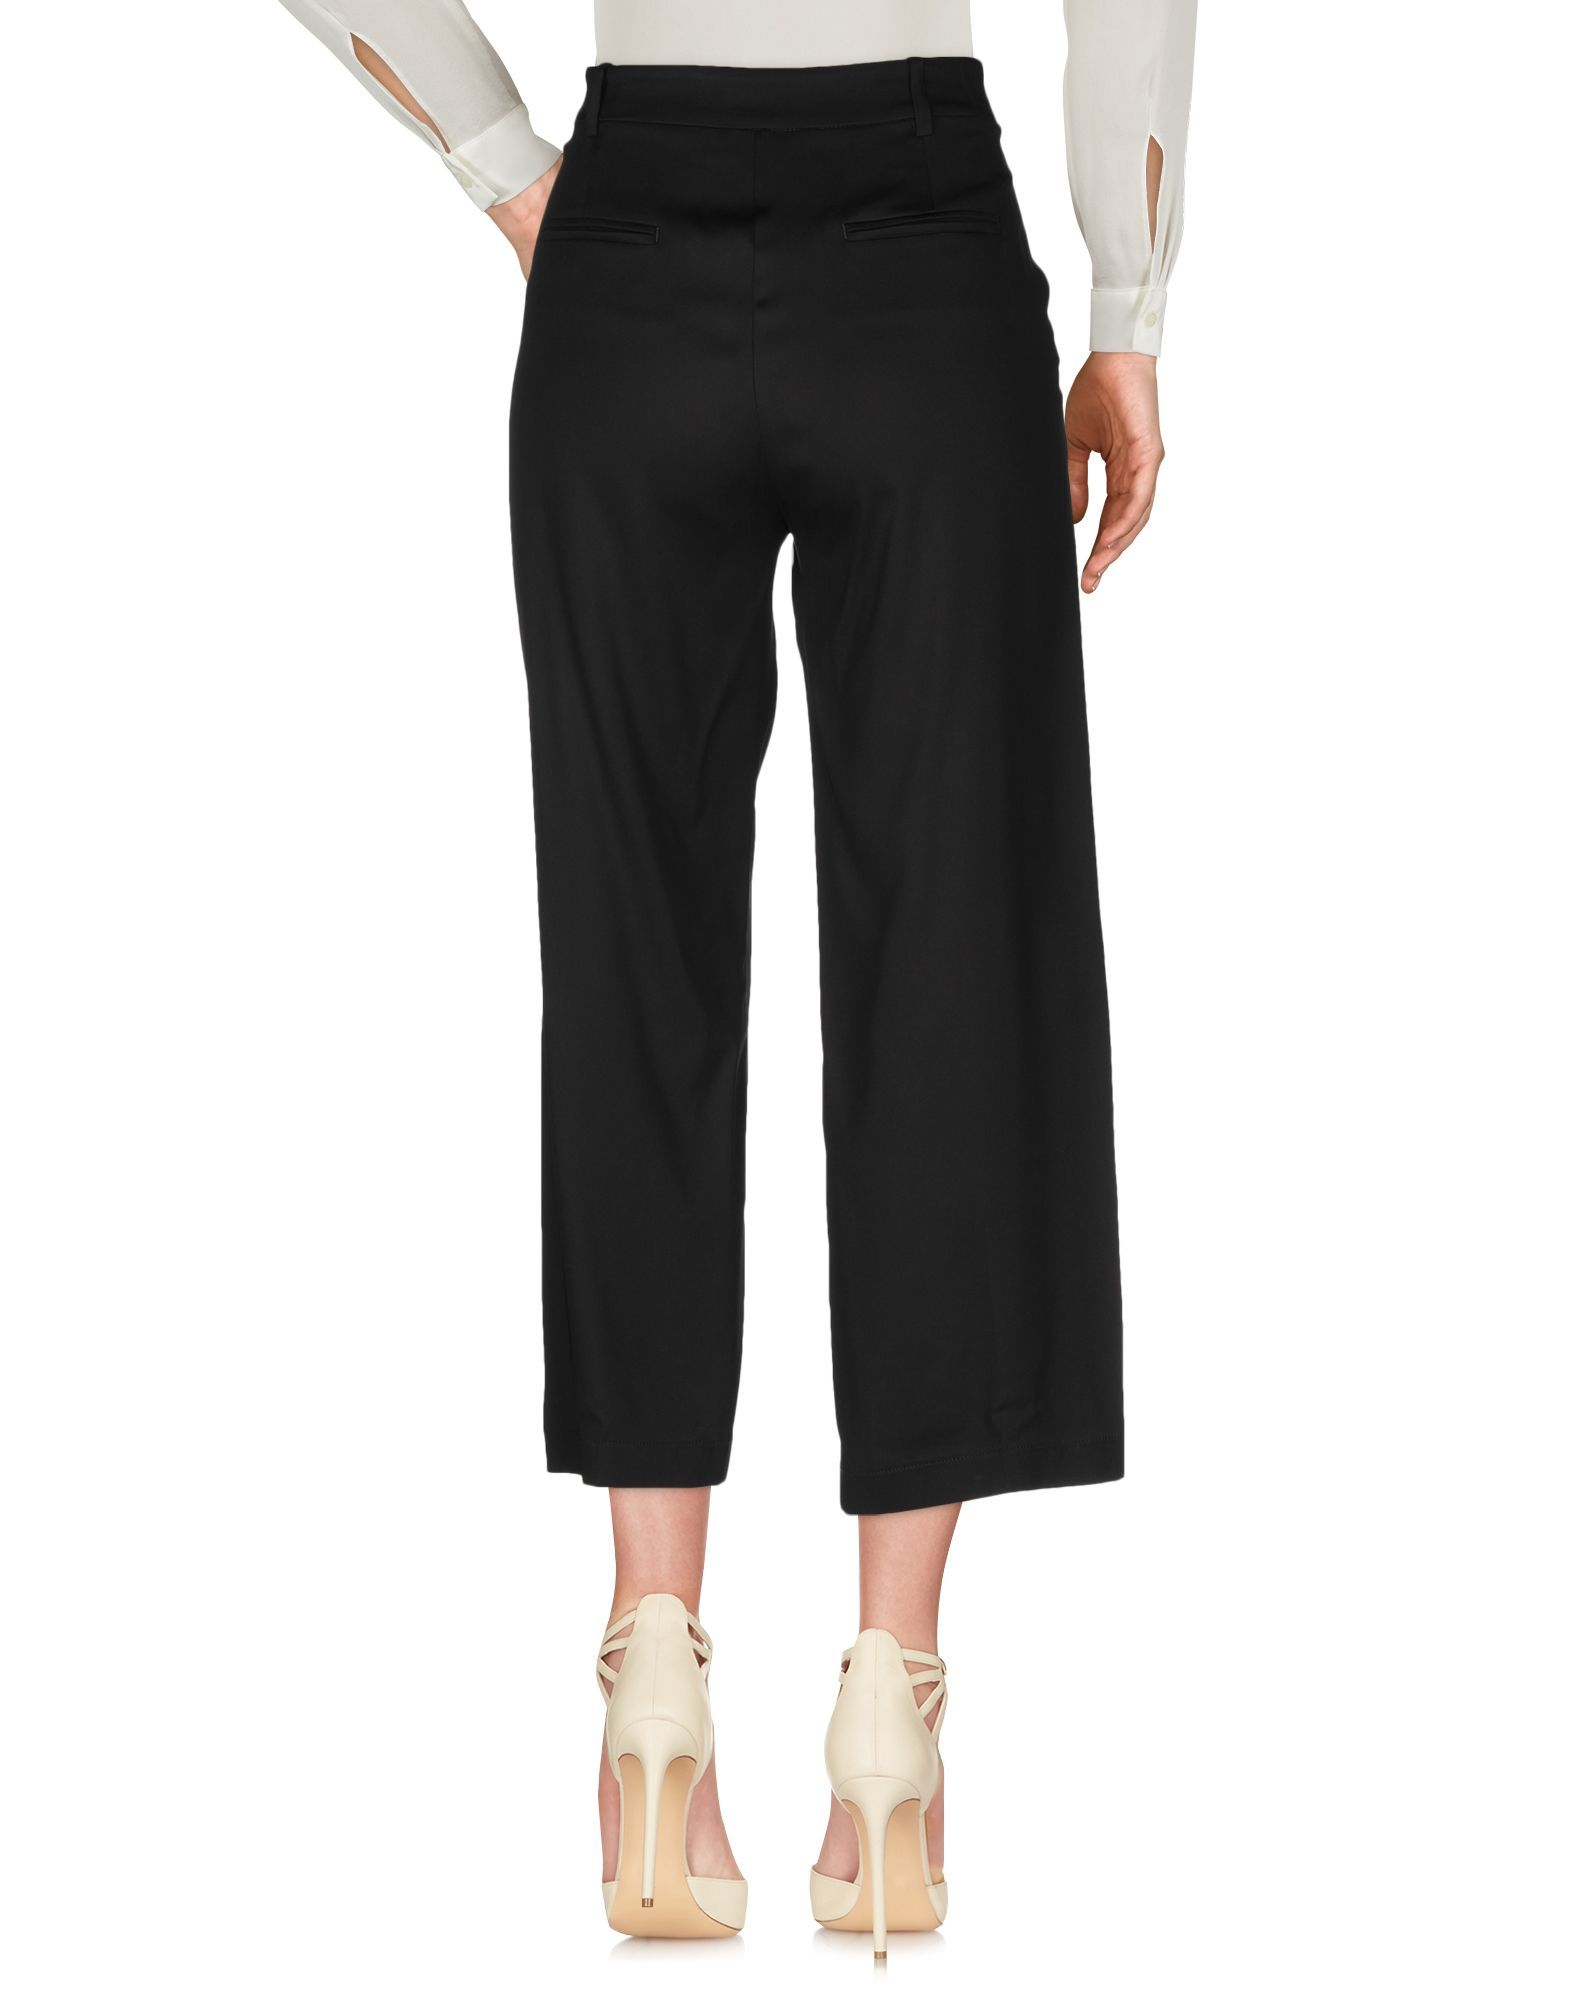 Pinko Black Trousers